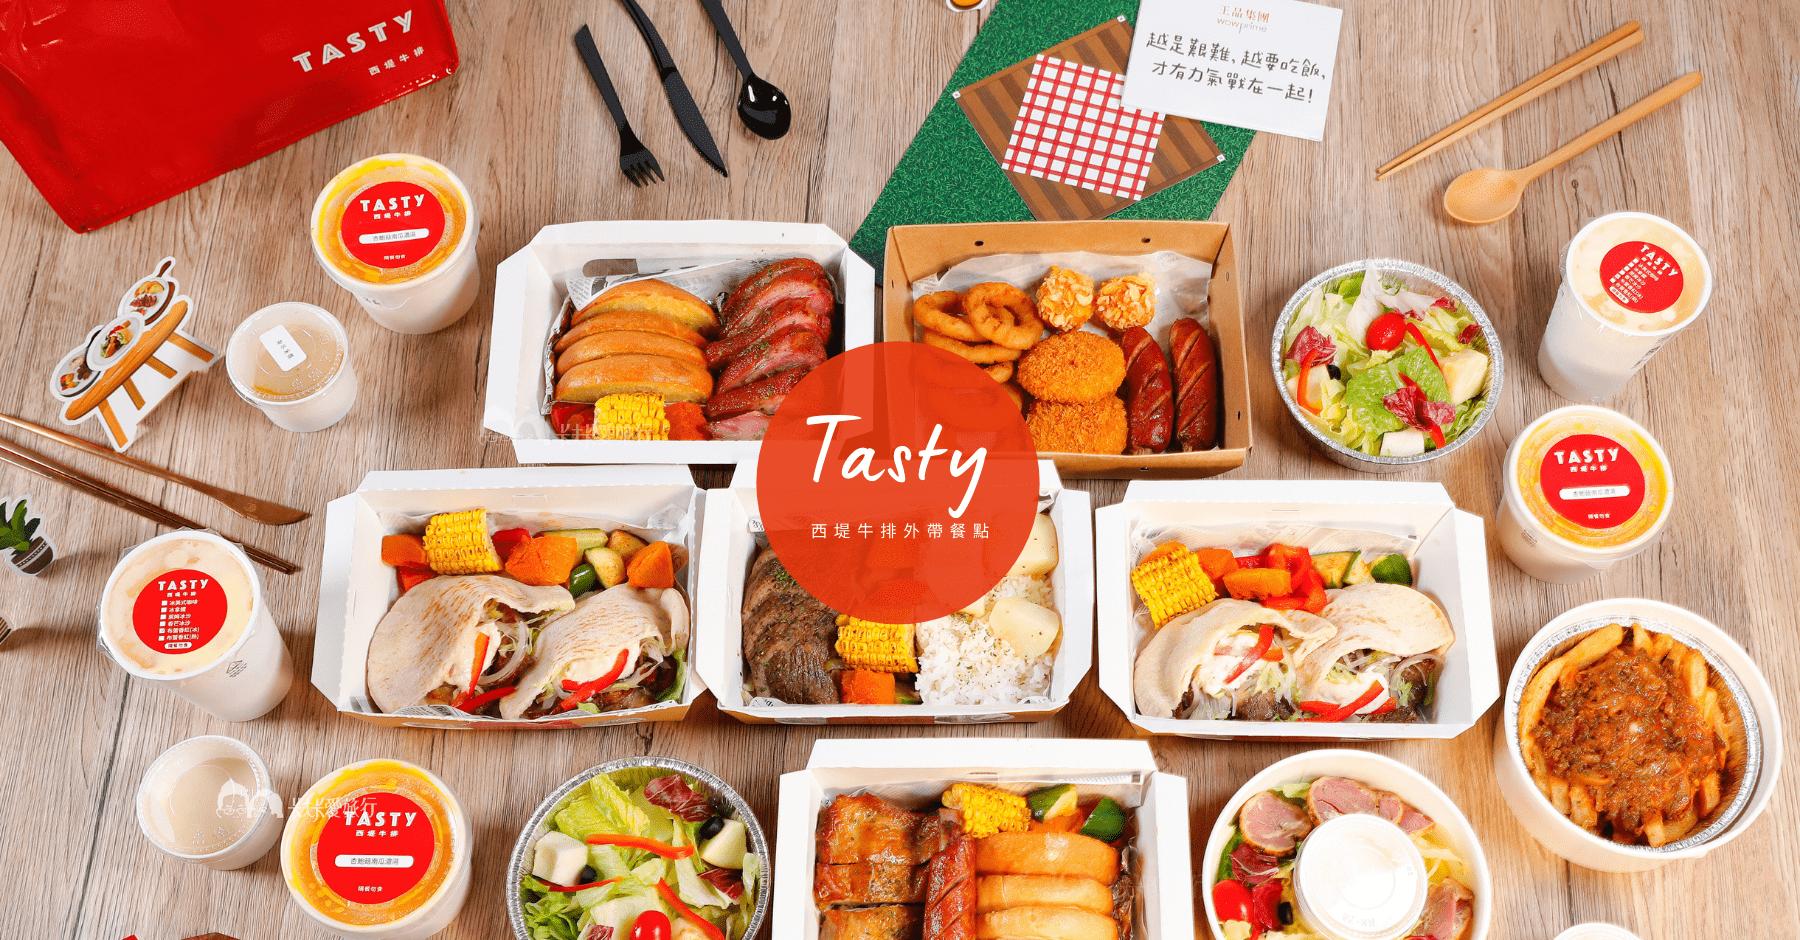 TASTY西堤牛排外帶全新菜單|不用出門在家也能享受高檔牛排餐點全新輕鬆點菜單優惠推薦